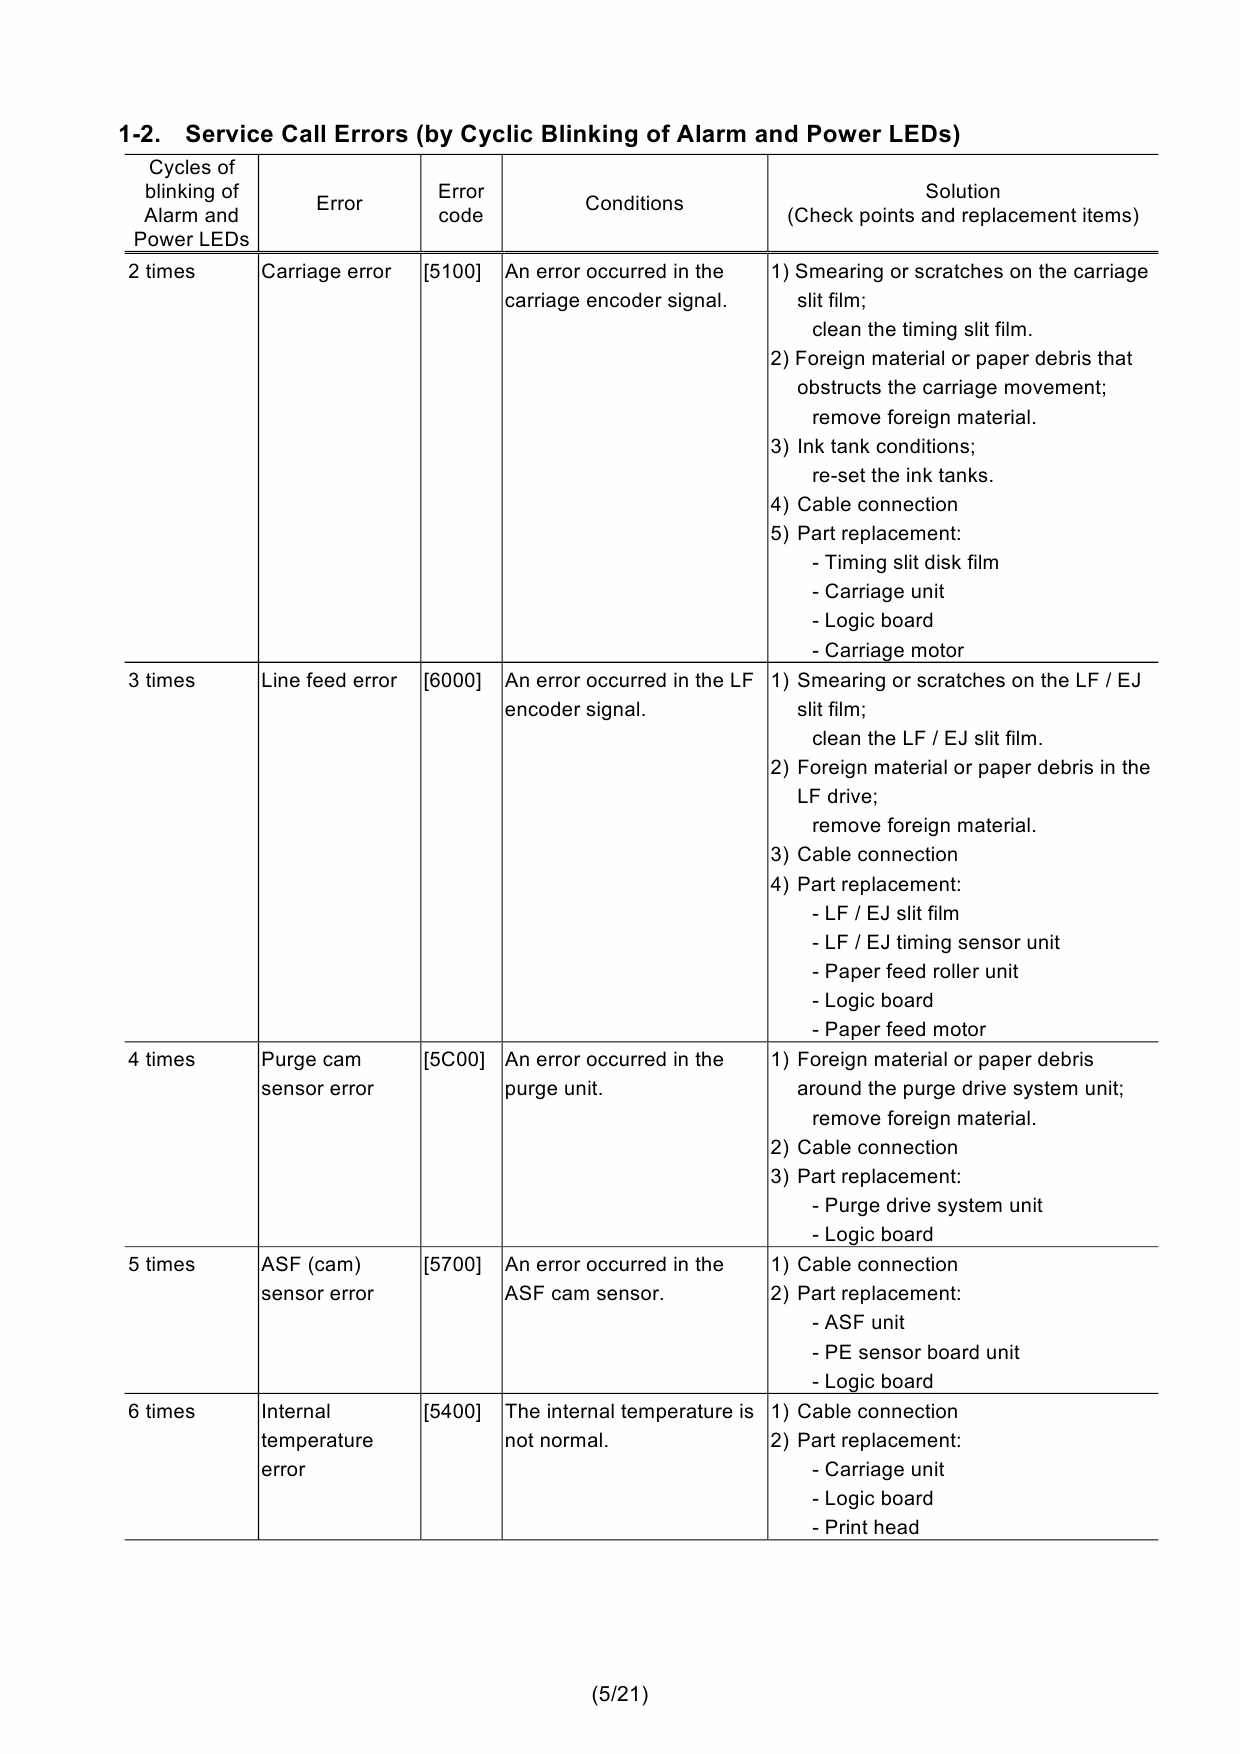 canon ip4600 error code c0000034